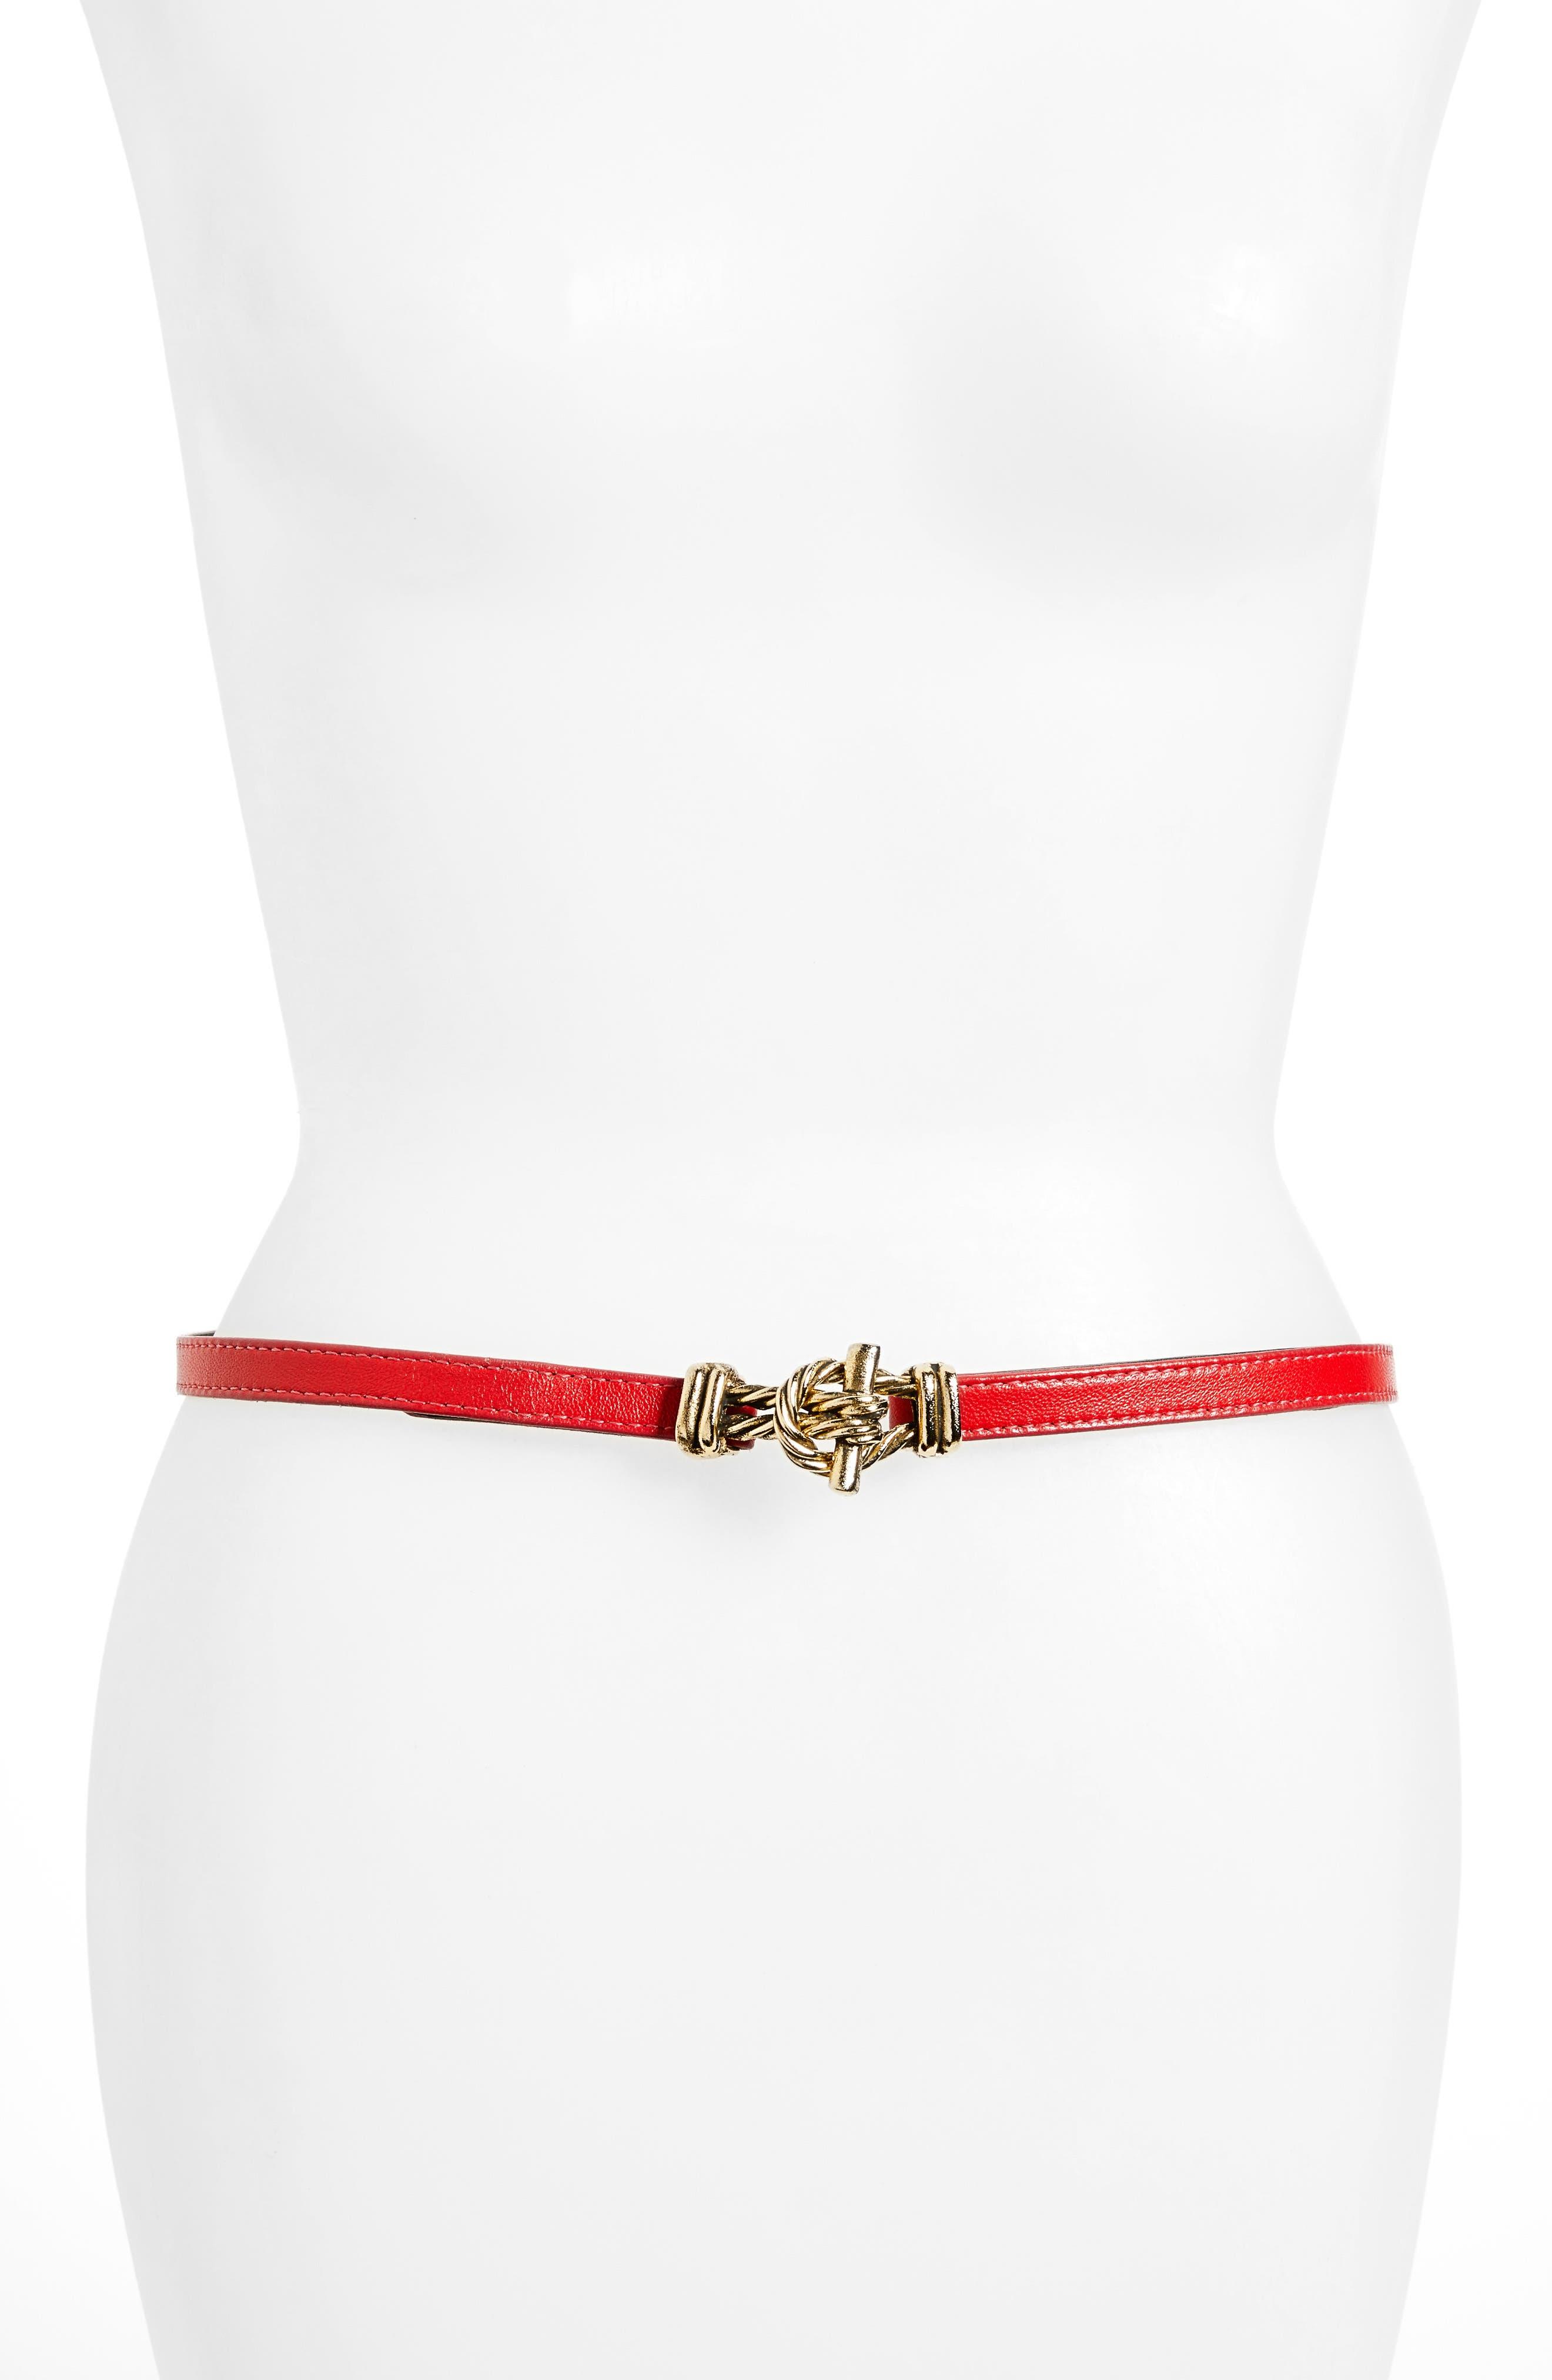 Raina Fitzgerald Leather Belt, Size One Size - Red